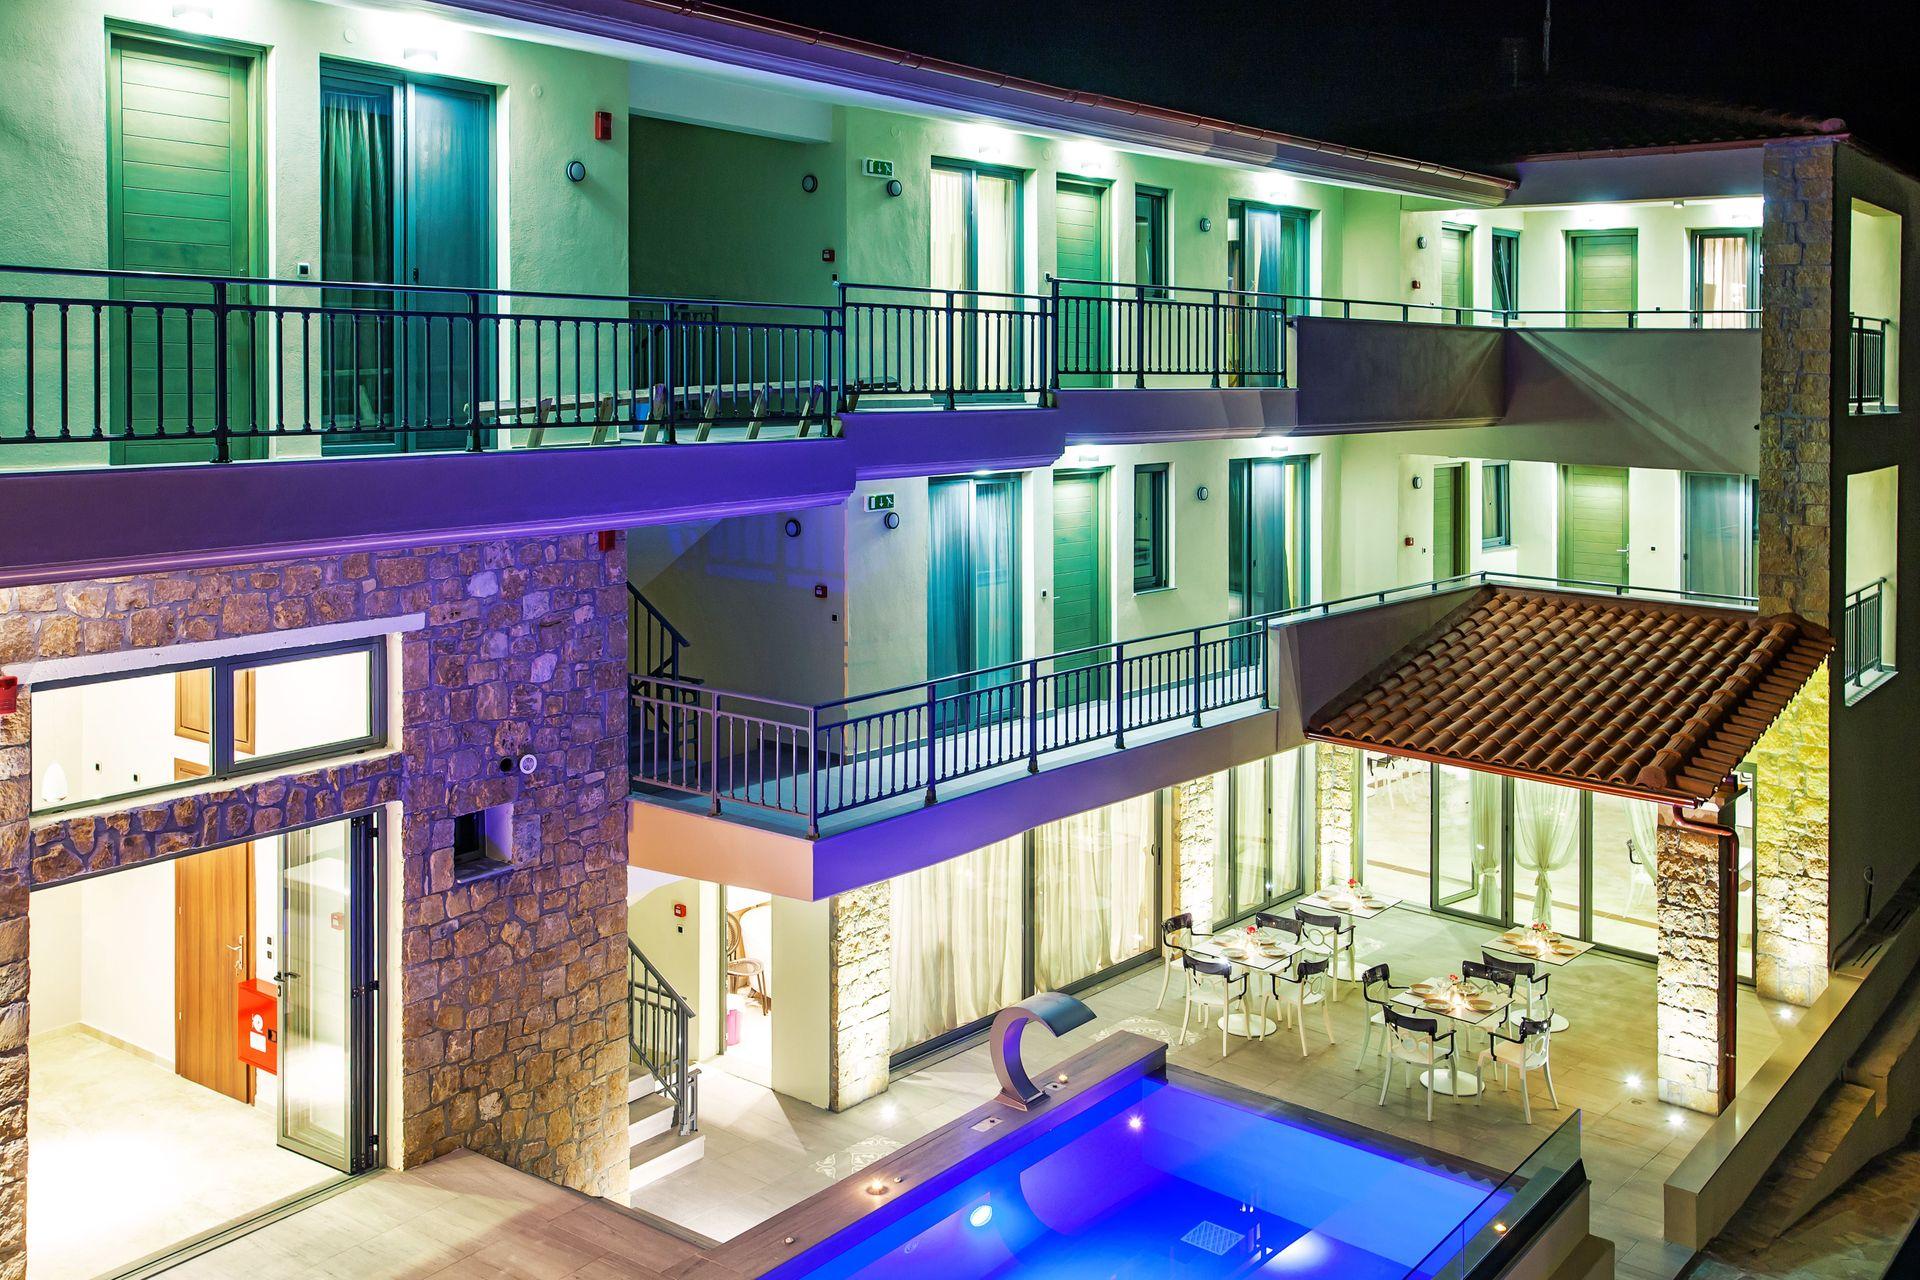 4* Core Hotel Chalkidiki - Πολύχρονο, Χαλκιδική ✦ 5